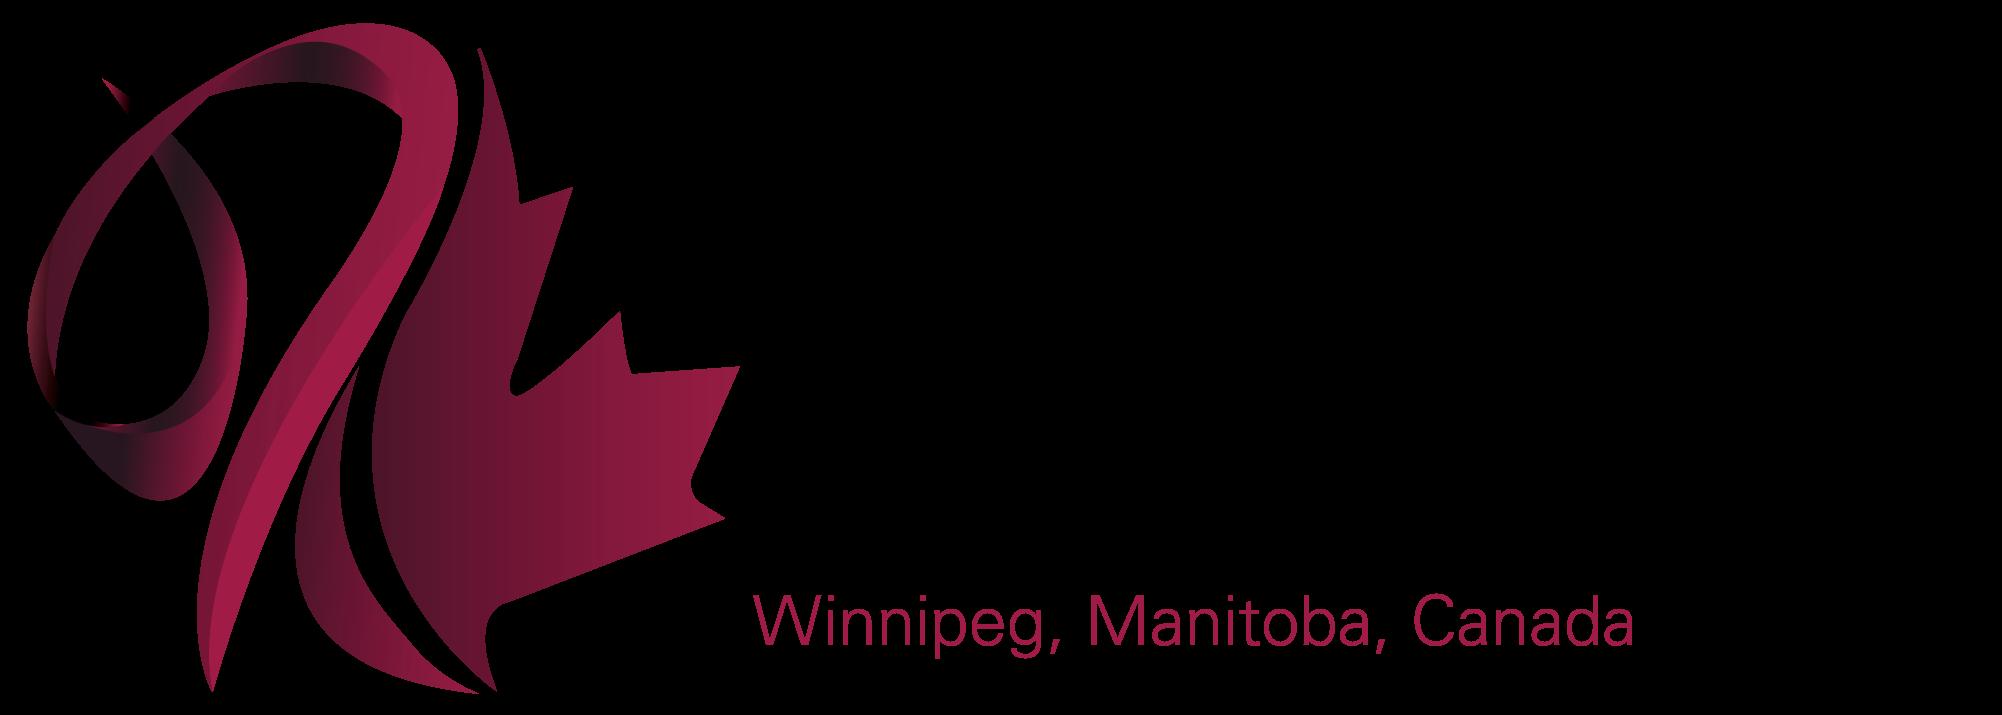 Pembina Trails International Student Program Winnipeg, Manitoba, Canada